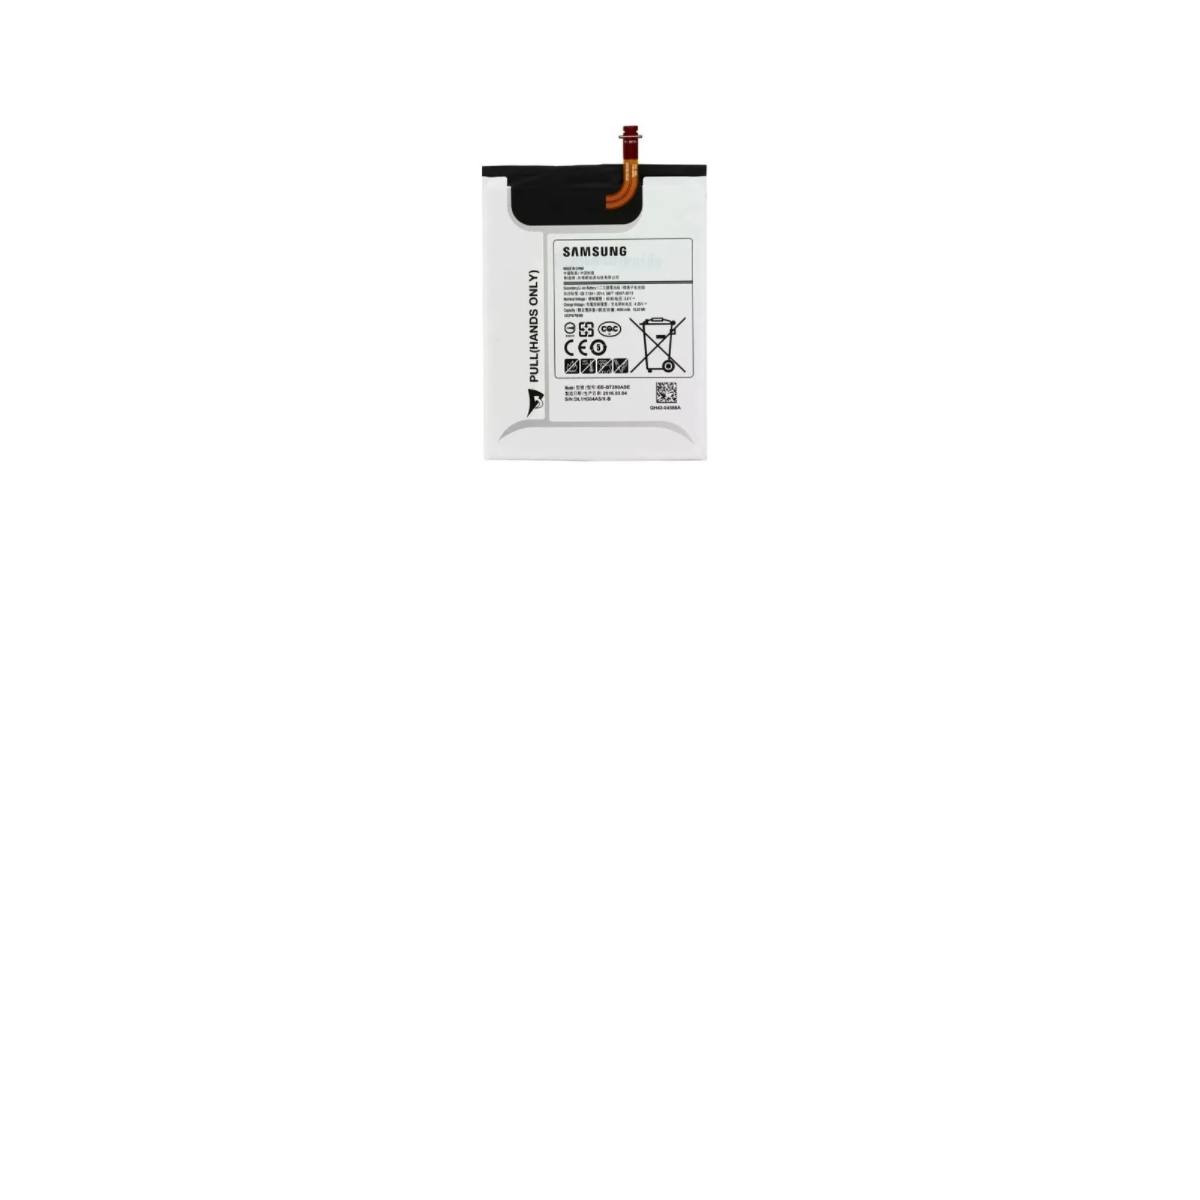 BATERIA TABLET SAMSUNG GALAXY TAB 7.0 T280 EB-T280ABE RETIRADA